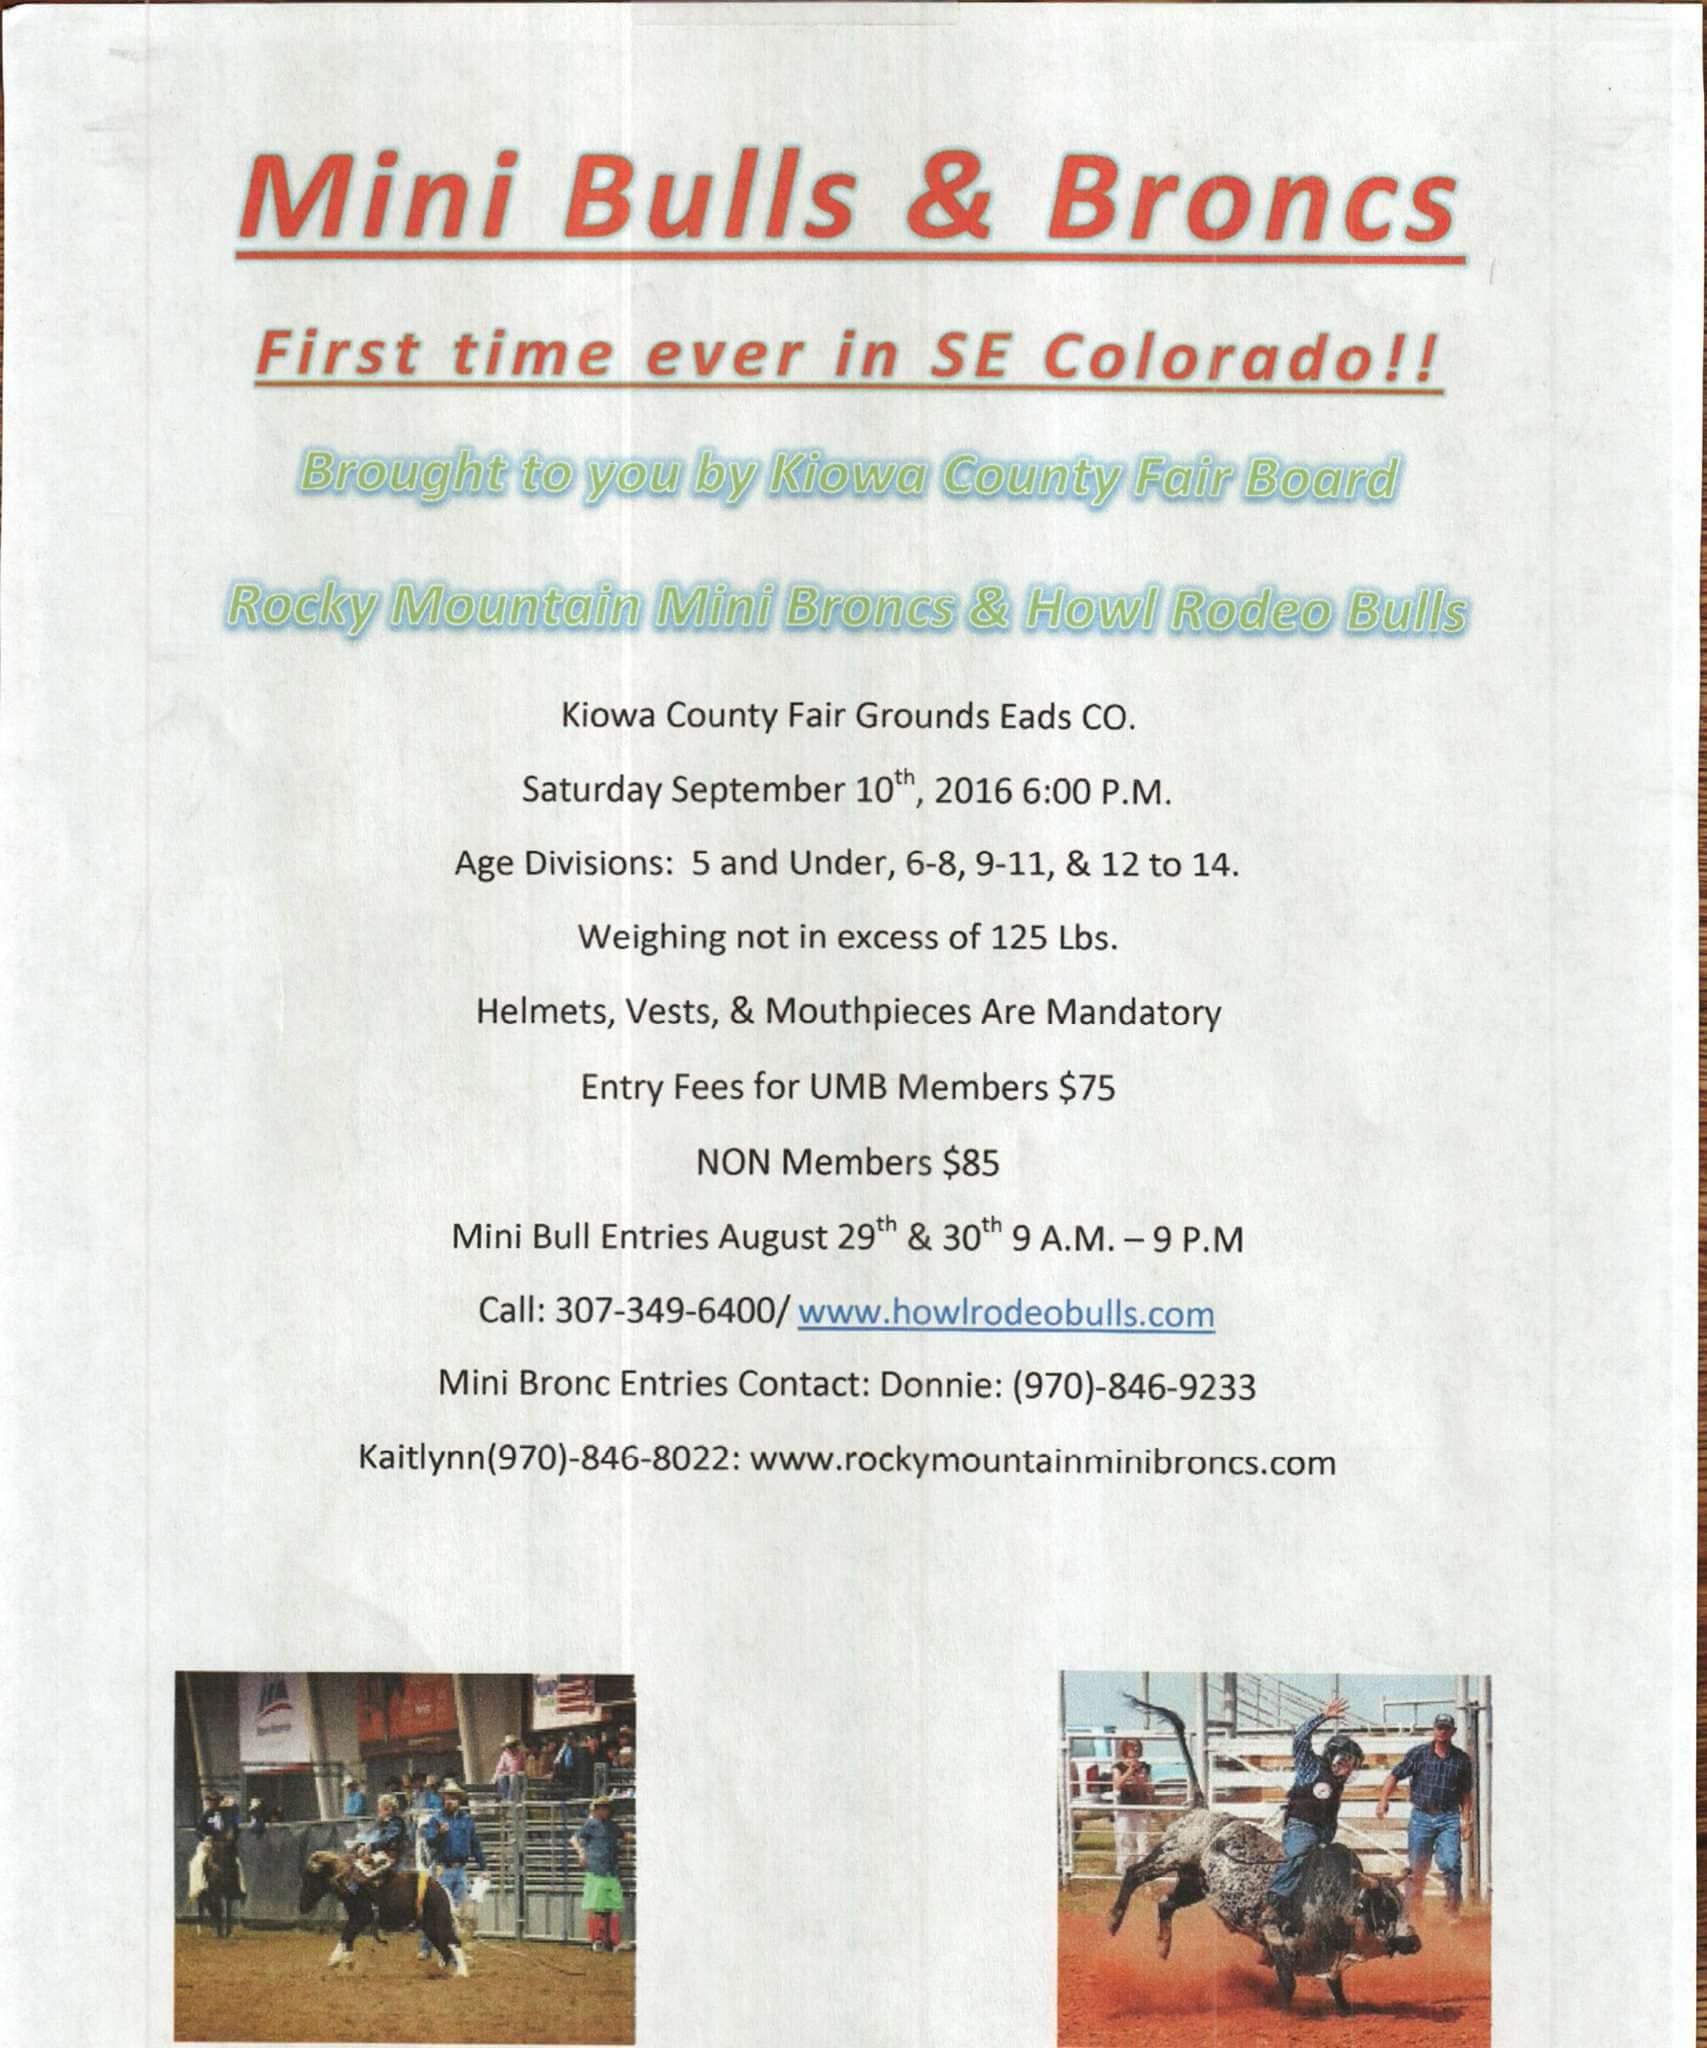 Mini Bulls at Kiowa County Fair